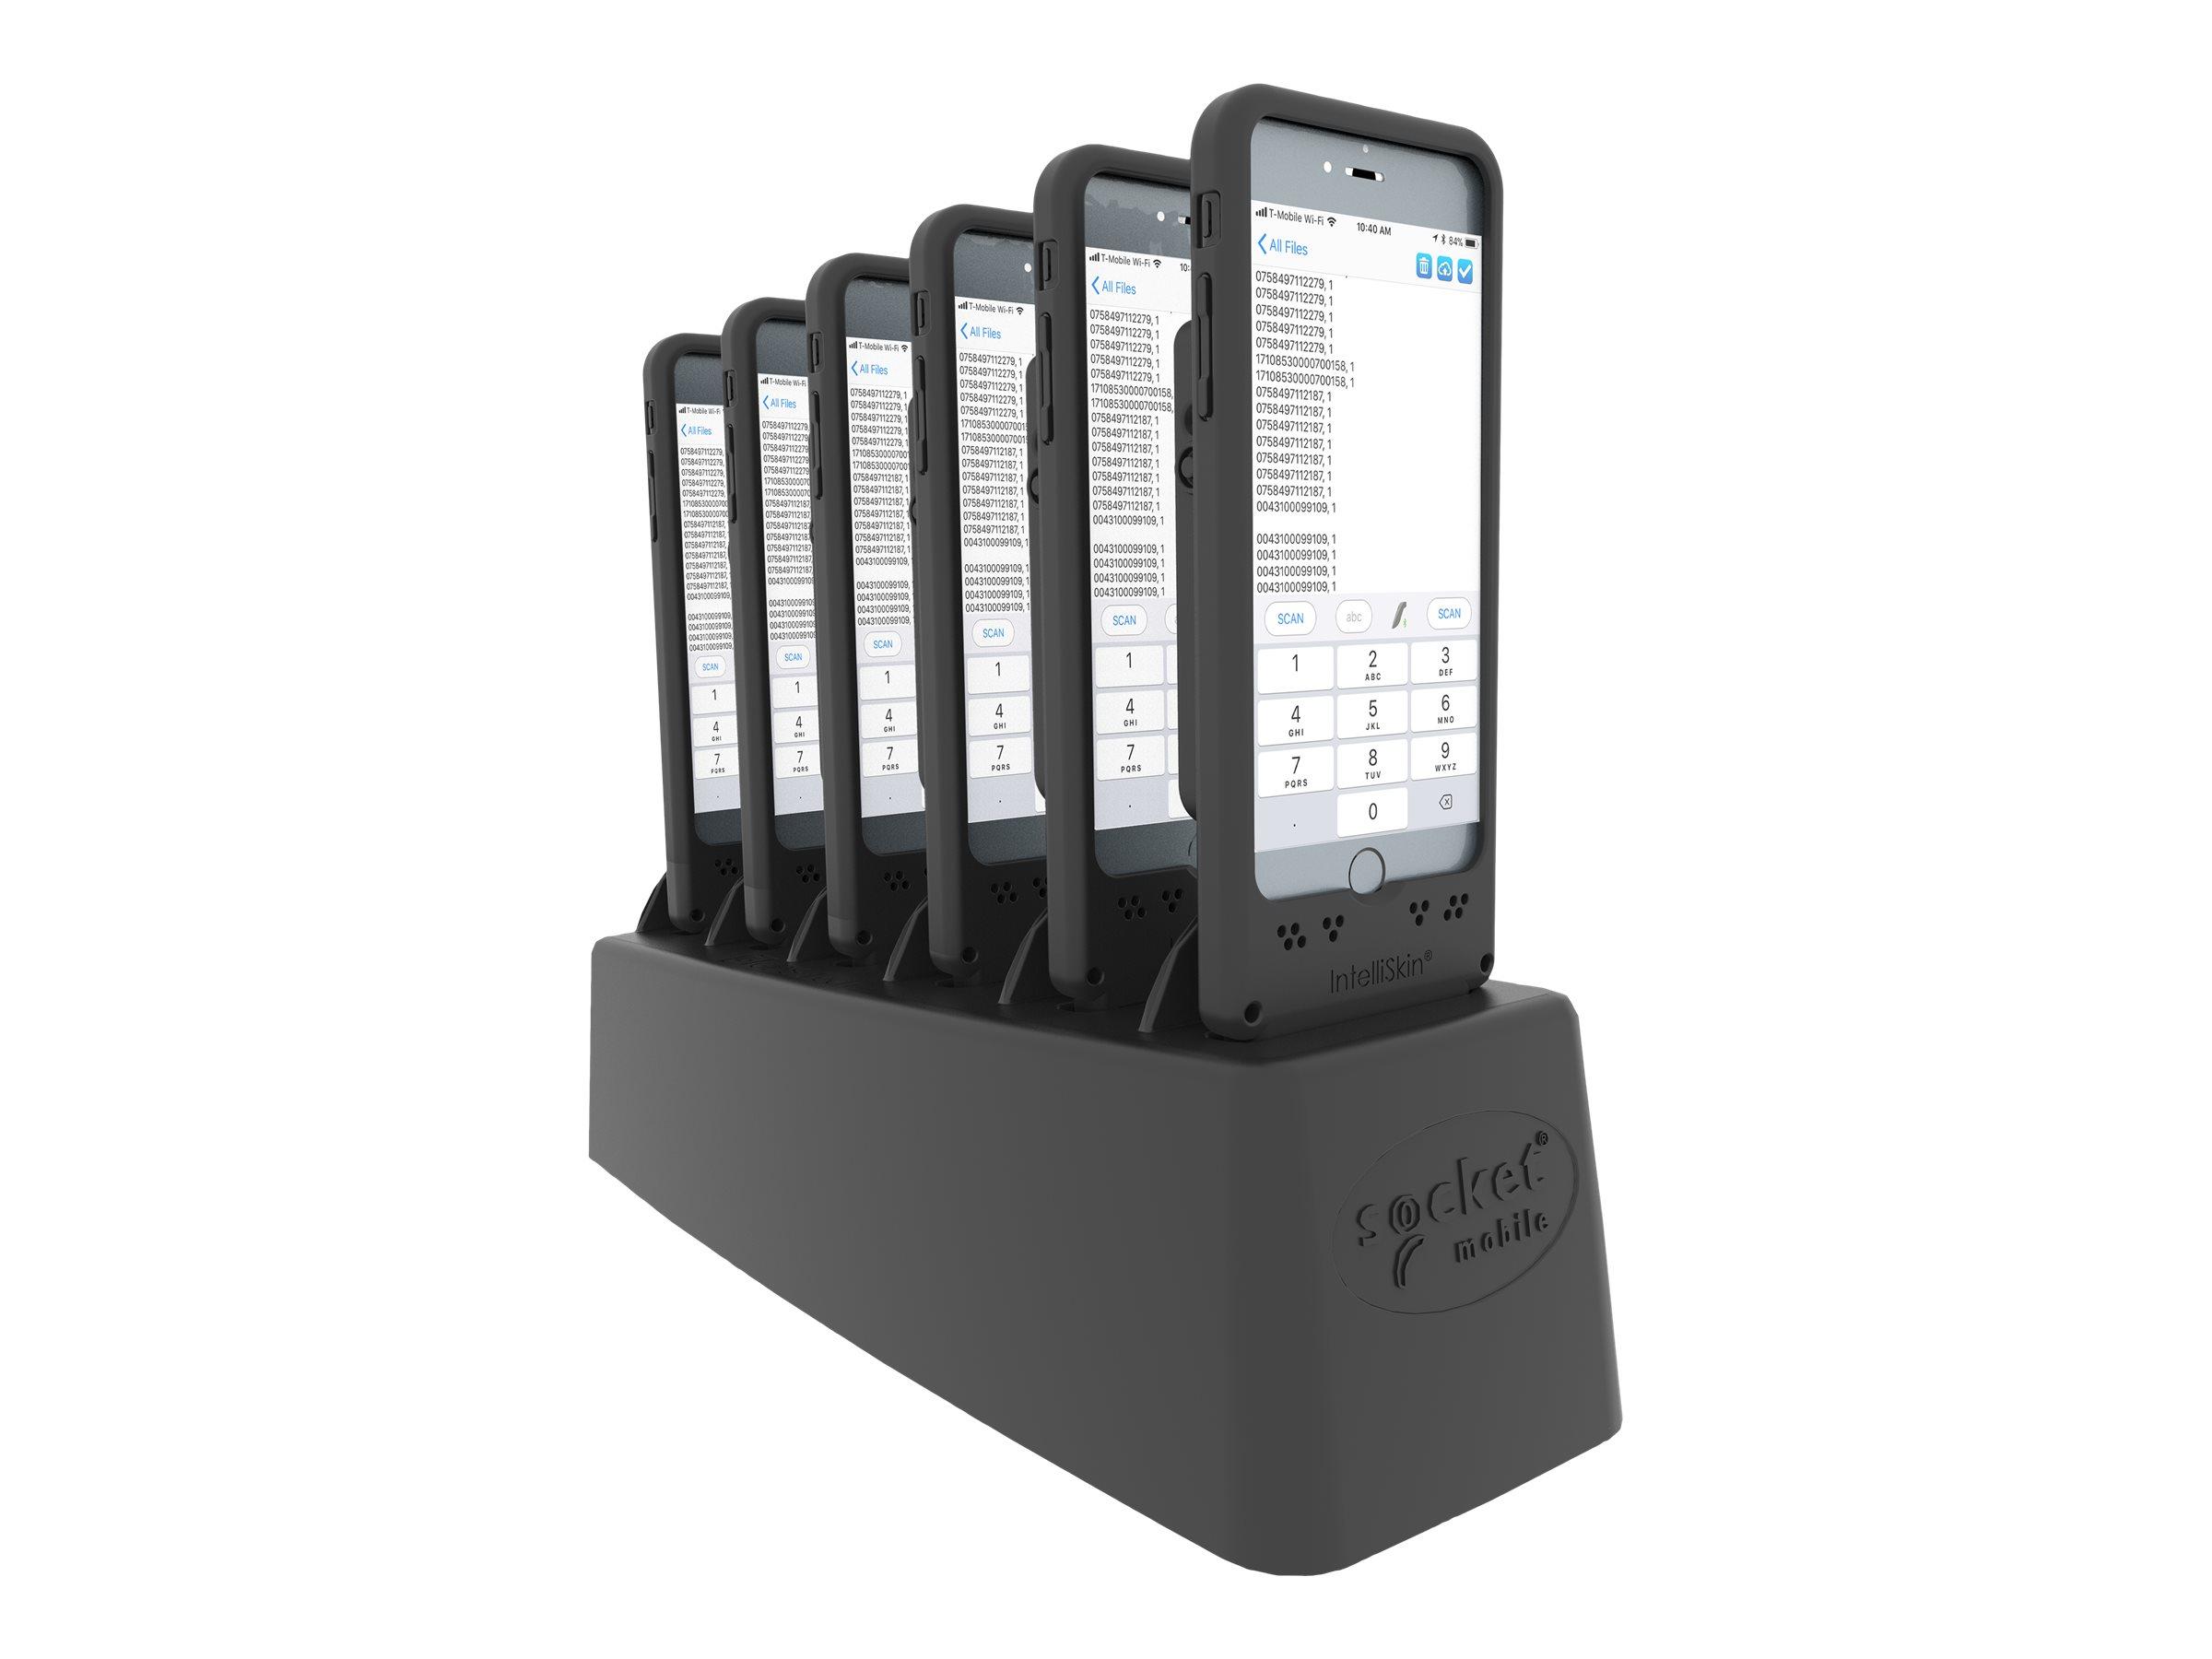 DuraSled DS800 - Mit 6 Bay Charger - Barcode-Scanner - Begleiter - Linear-Imager - decodiert